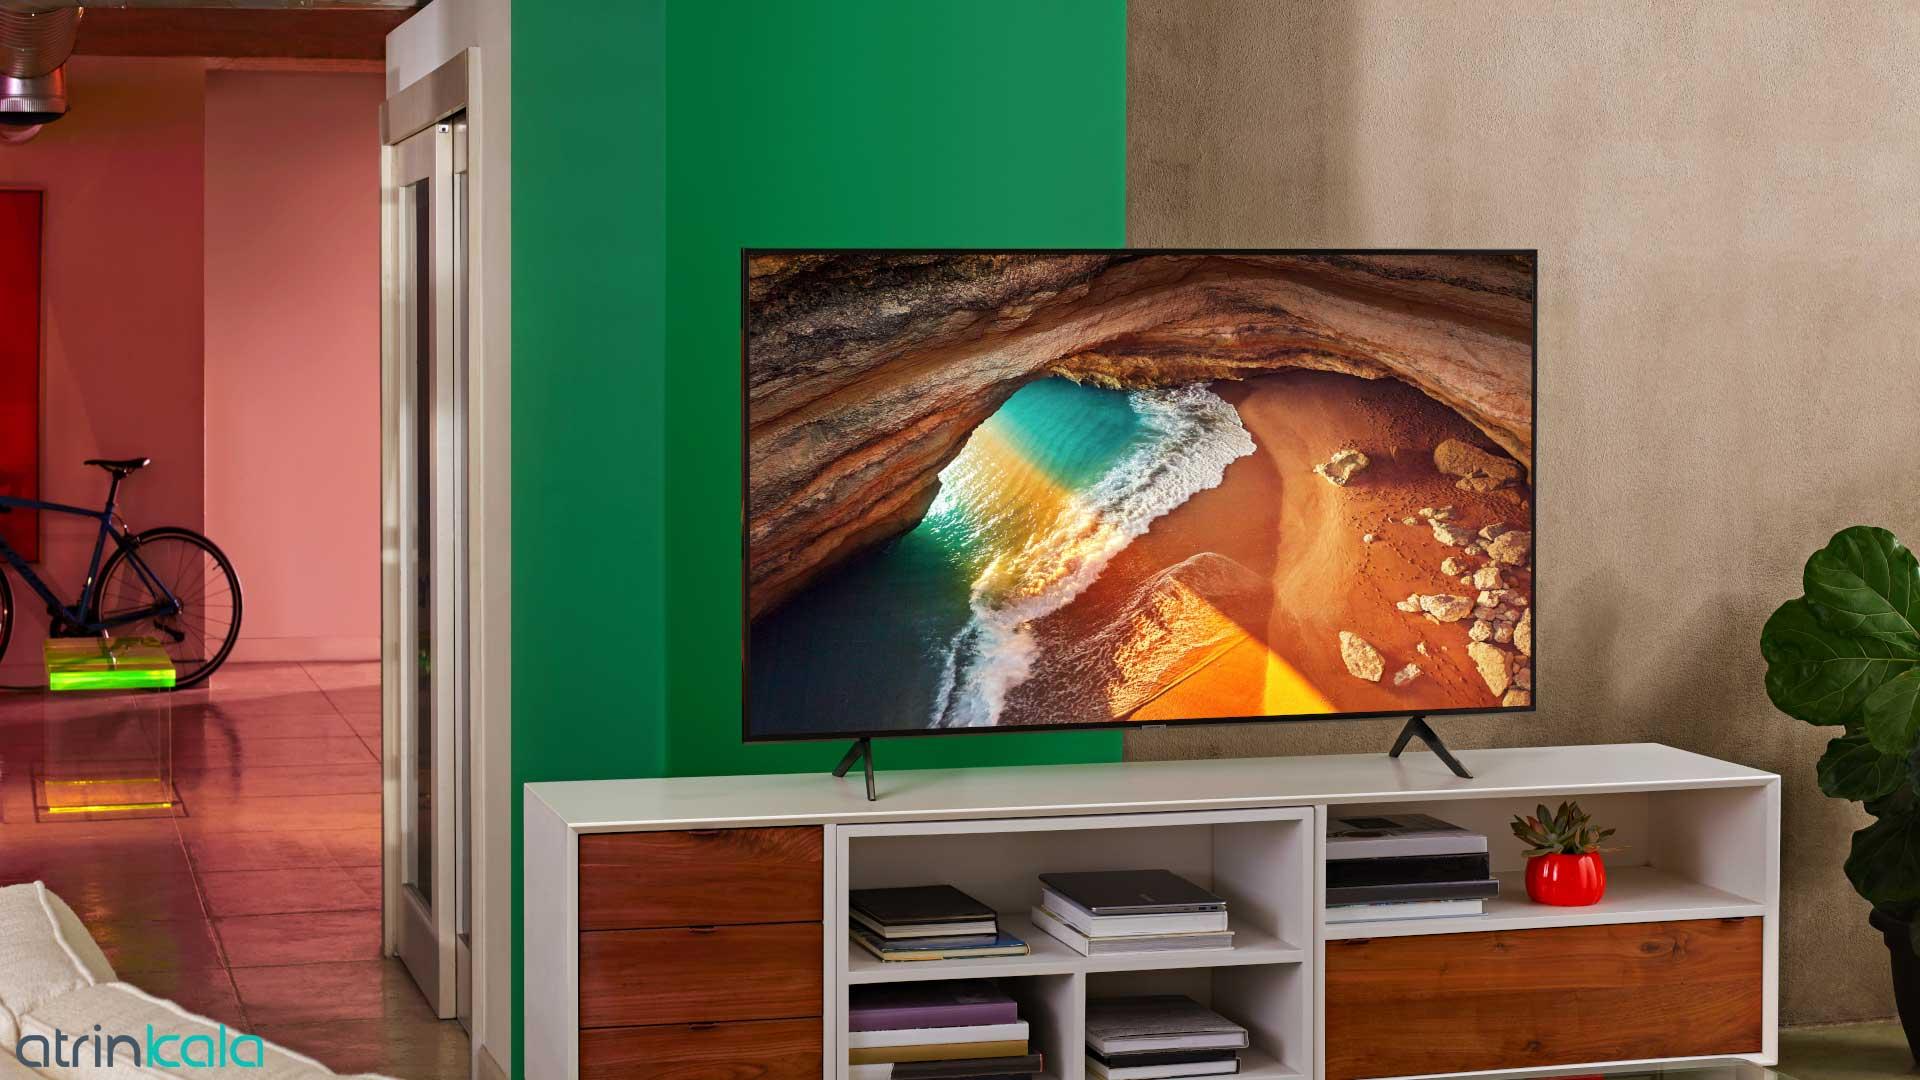 تلویزیون سامسونگ کیولد Q60R